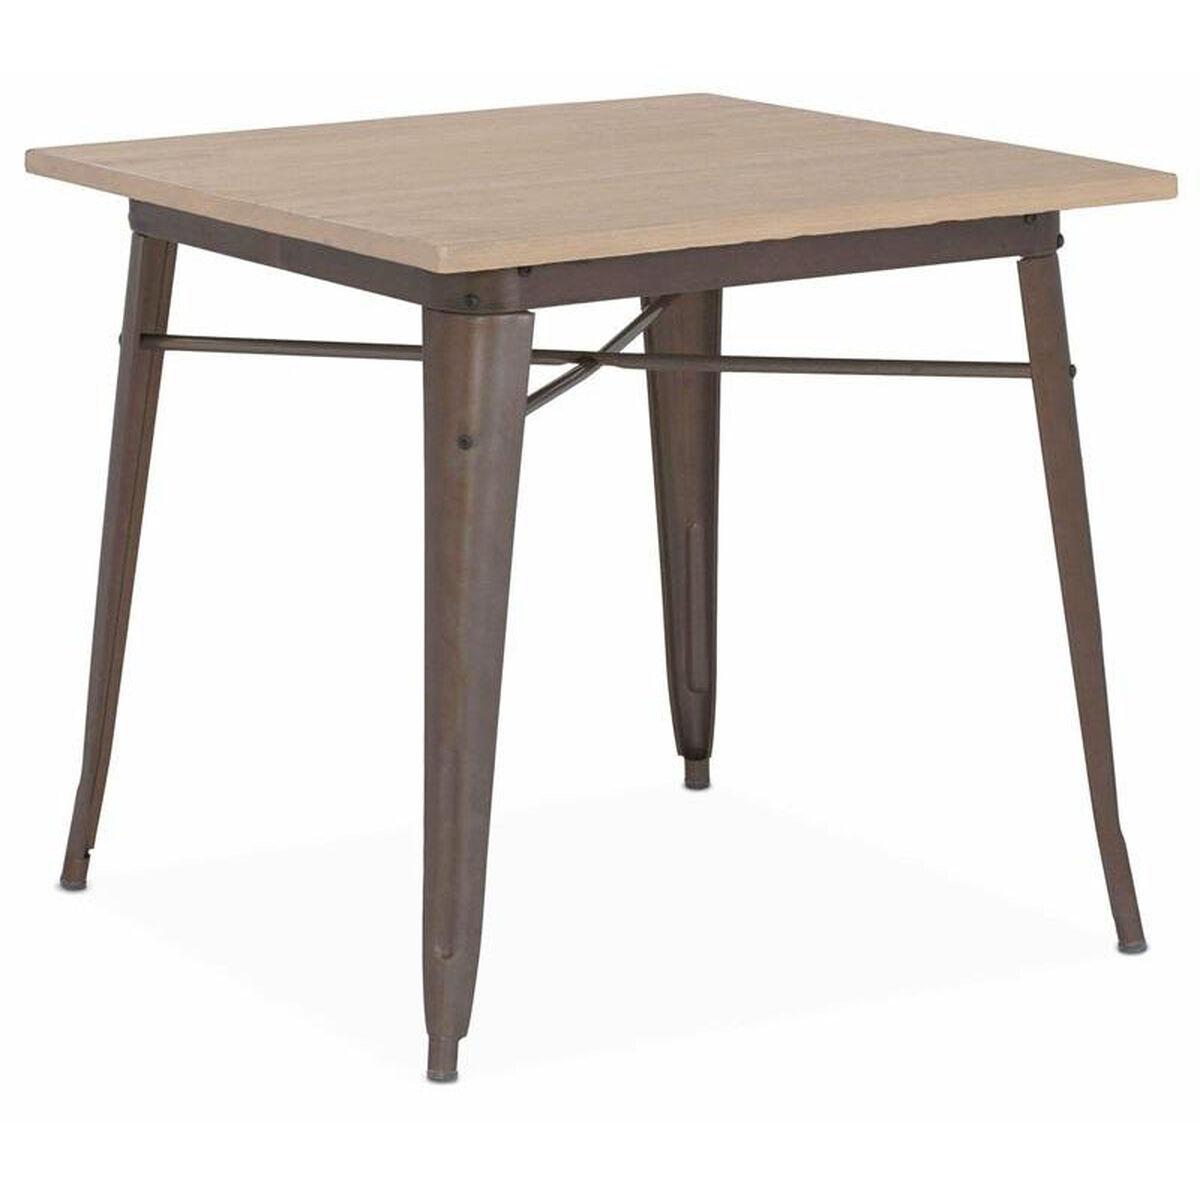 Dreux Rustic Matte Dining Table Ls 9120 Rmtlw Bizchair Com